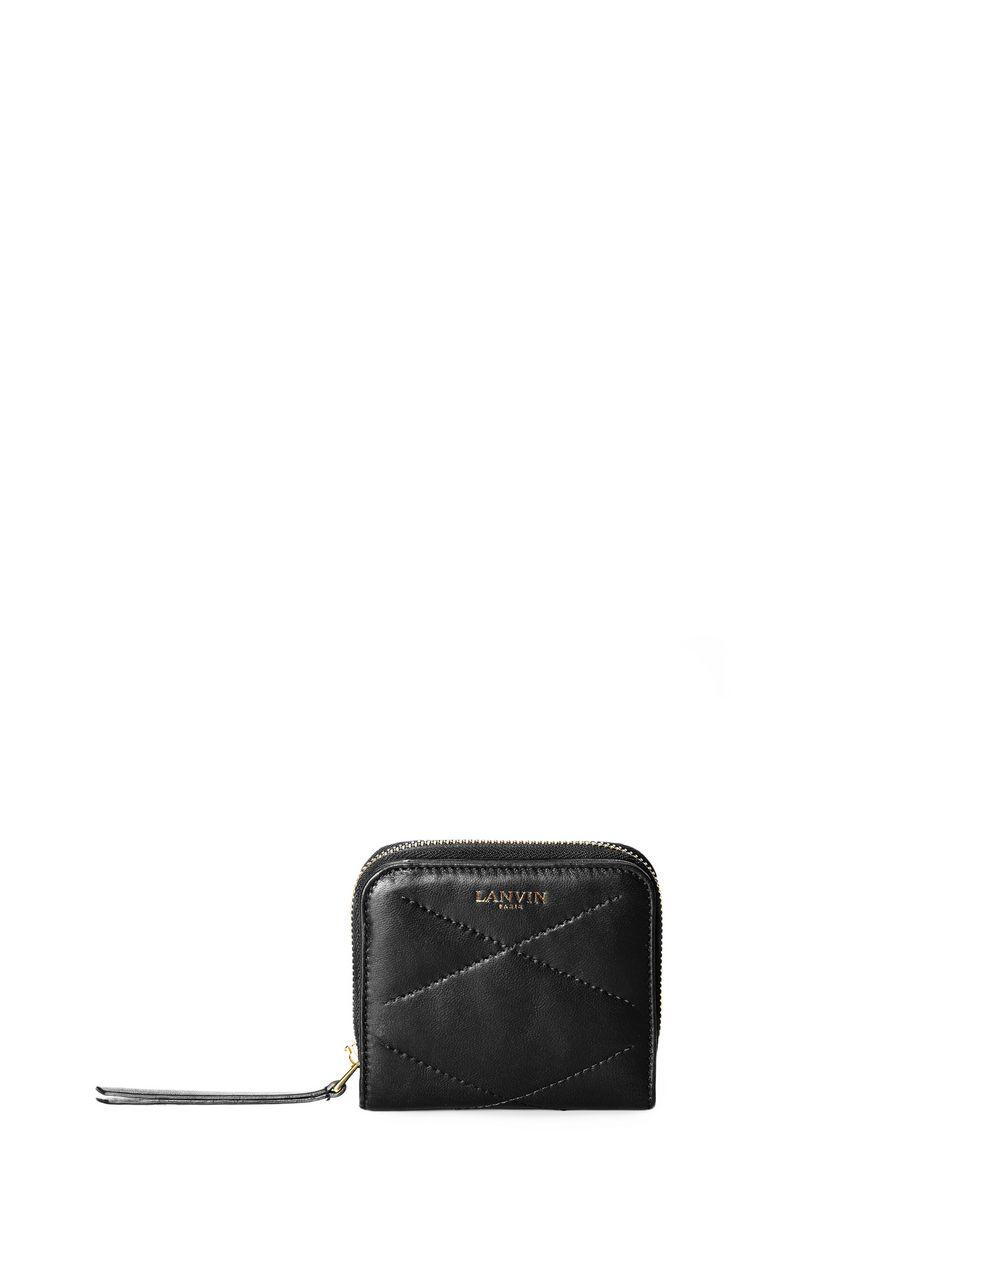 Compact clutch - Lanvin